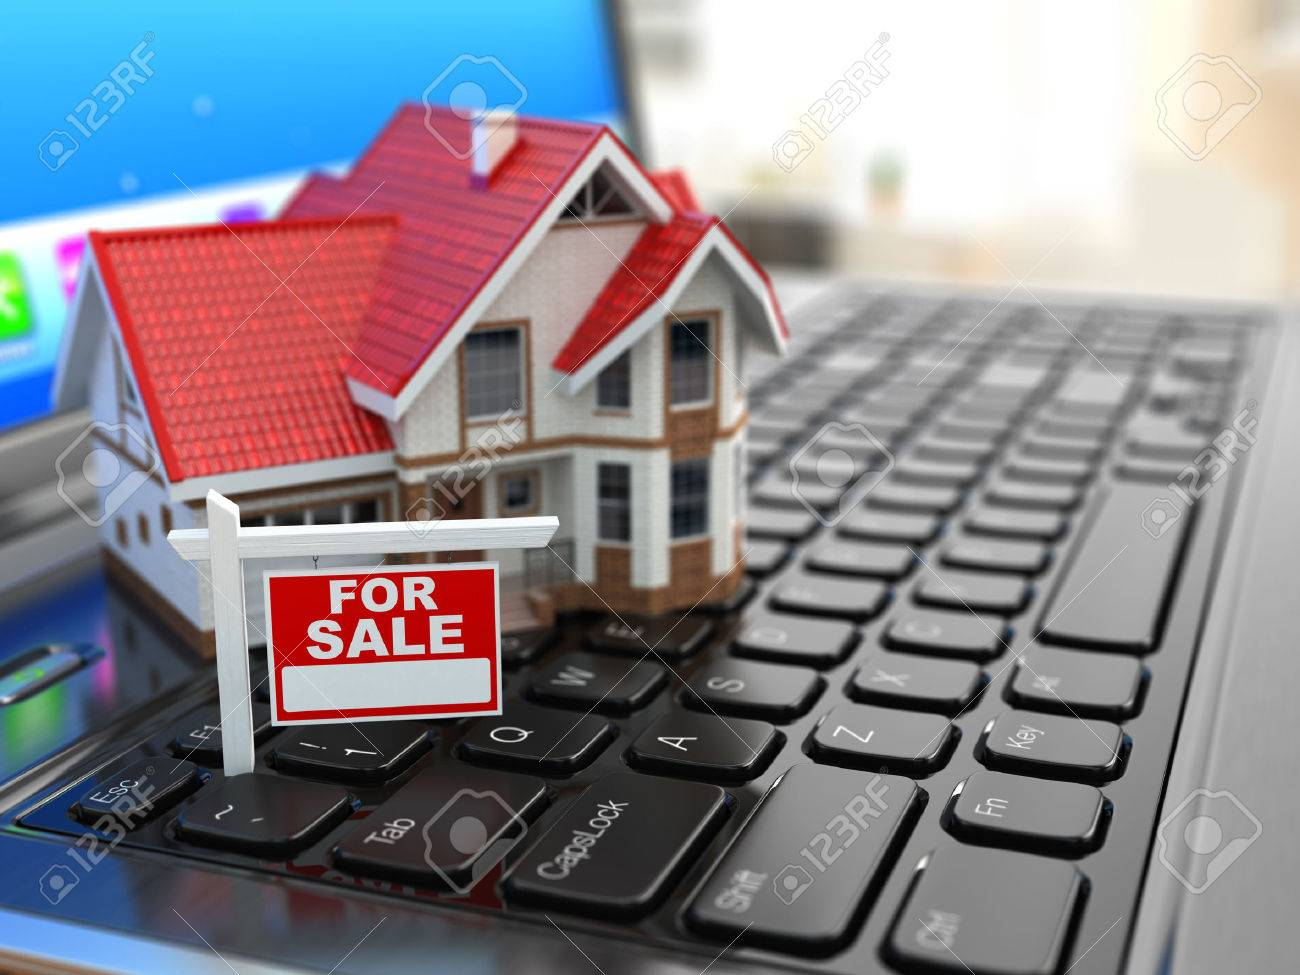 Belleville Real Estate Quinte Real Estate Loyalist Realty Inc Real estate photo service